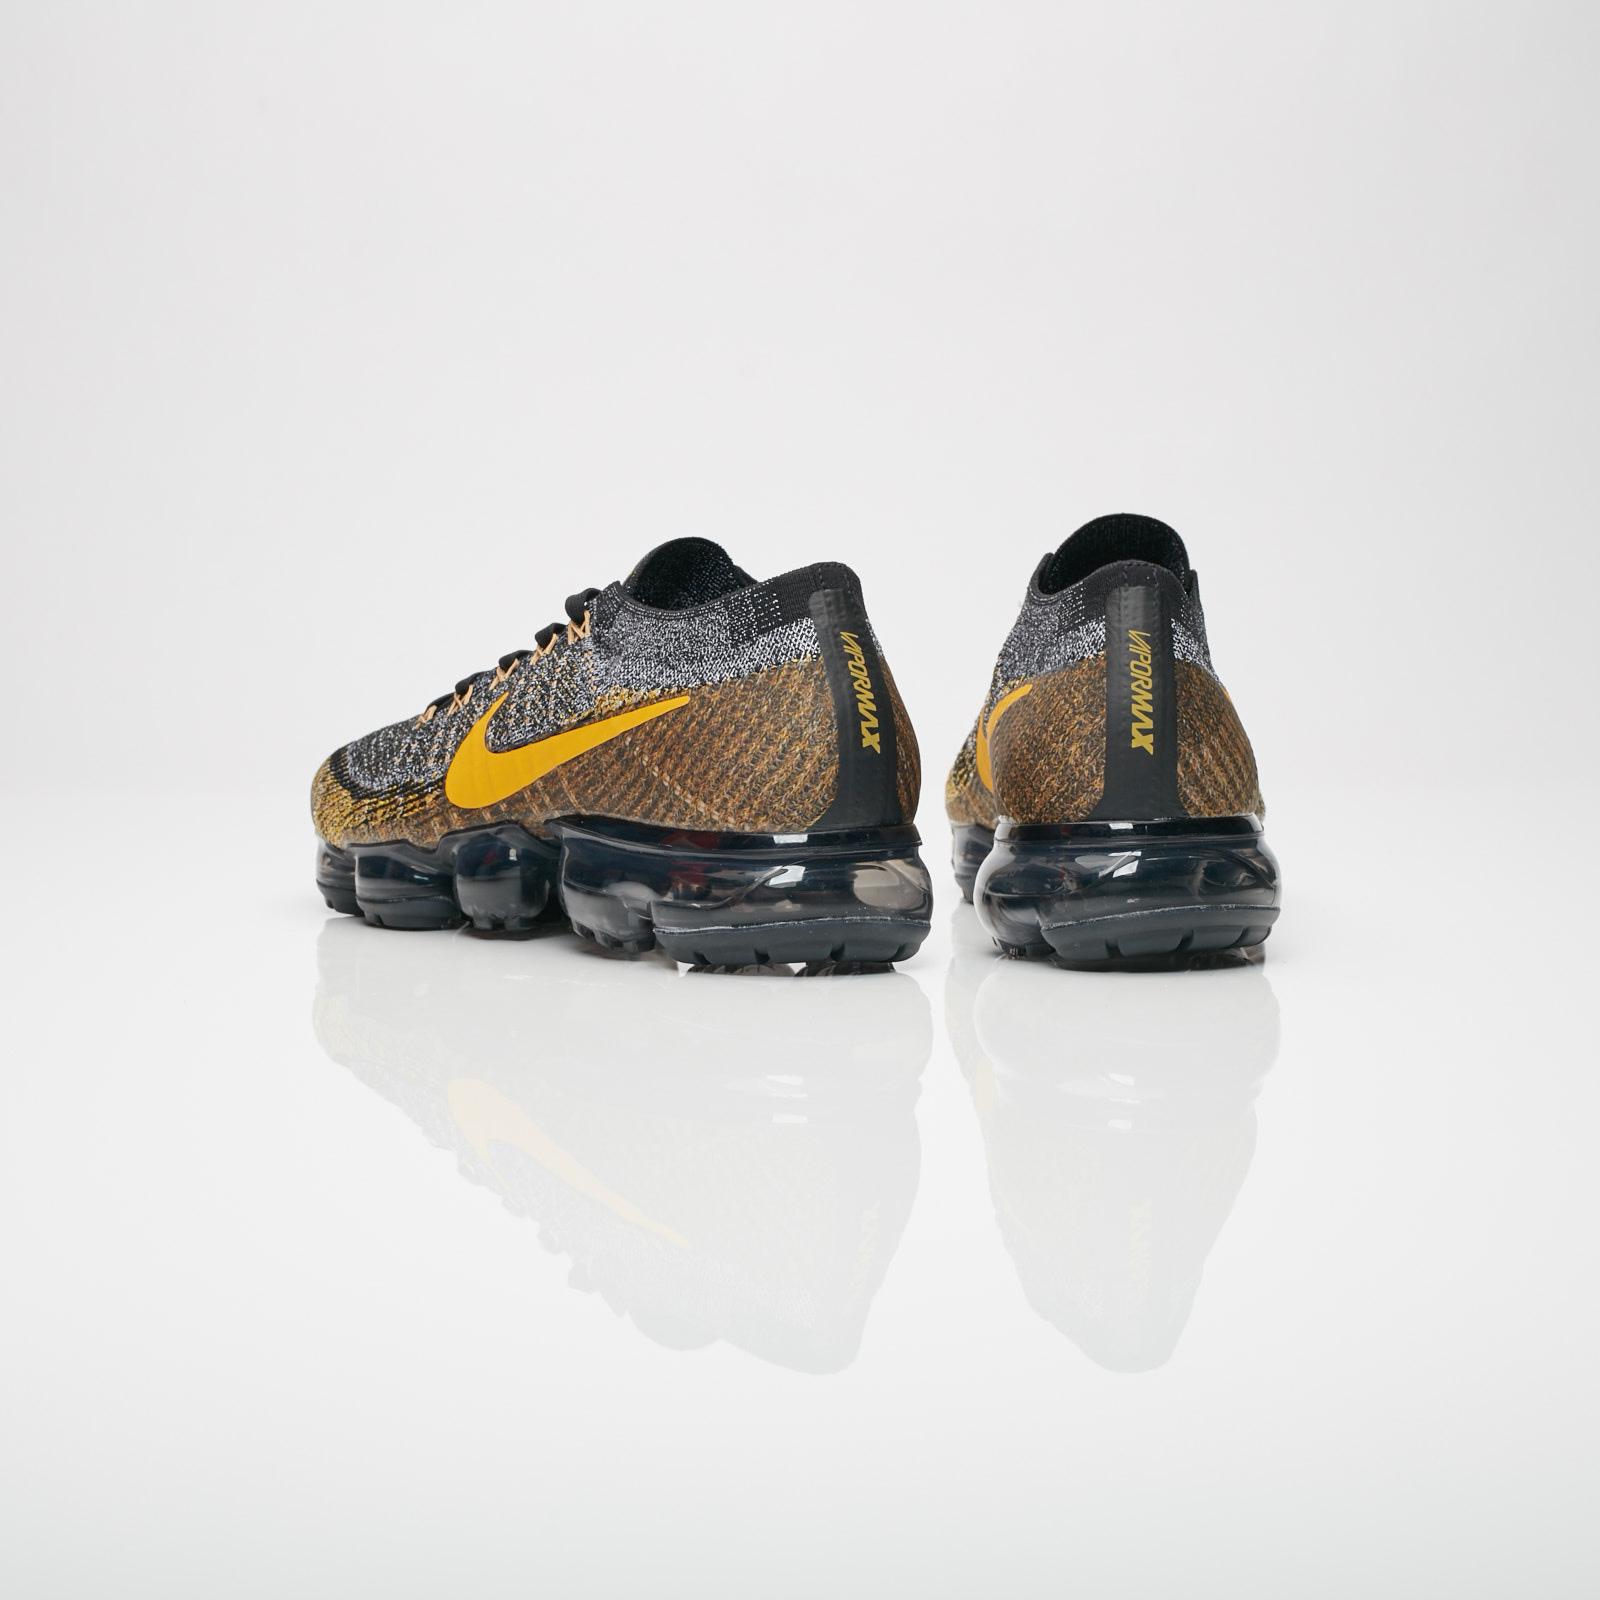 f467d5ca97ba Nike Sportswear Air Vapormax Flyknit Nike Sportswear Air Vapormax Flyknit  ...